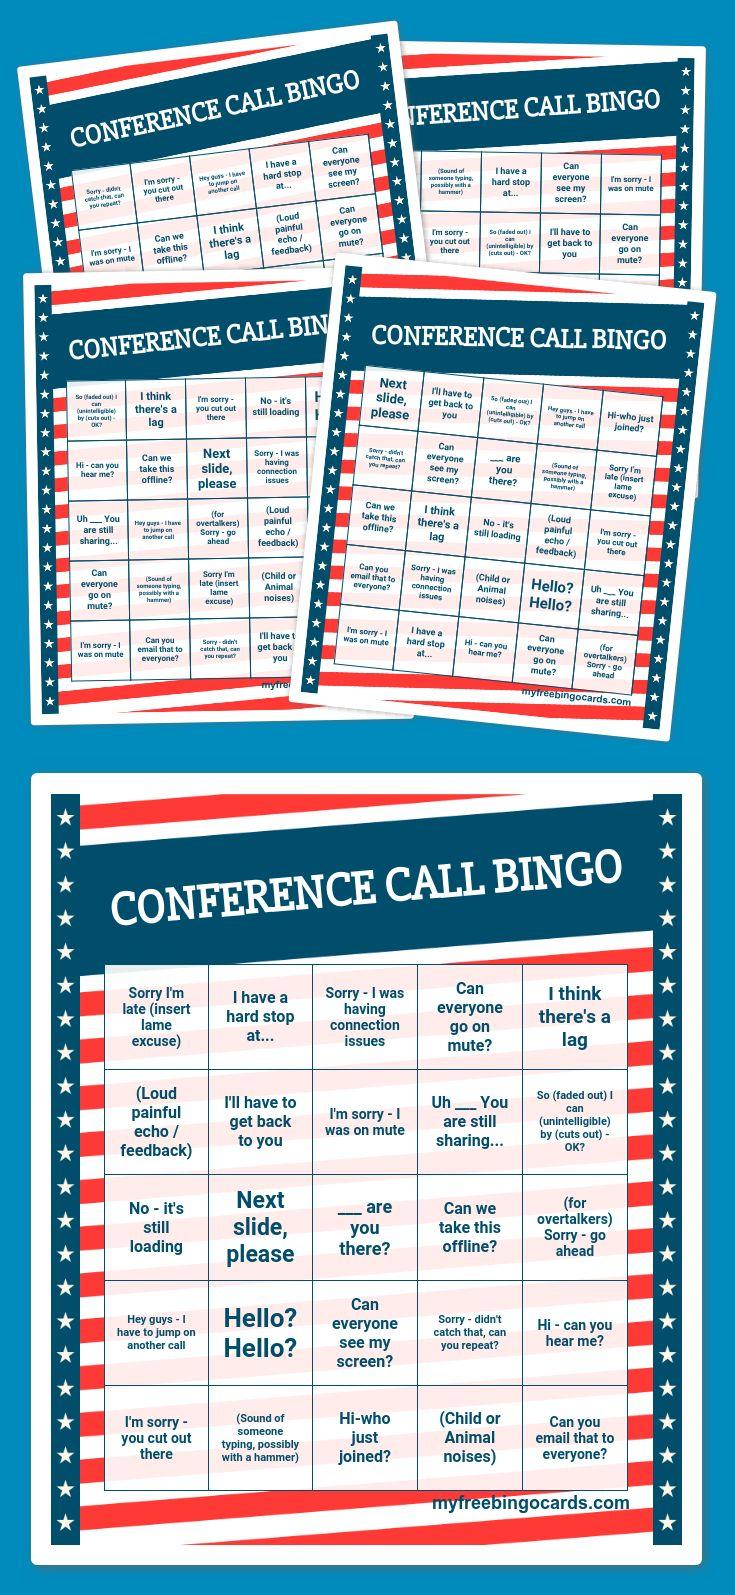 CONFERENCE CALL BINGO Bingo card generator, Free bingo